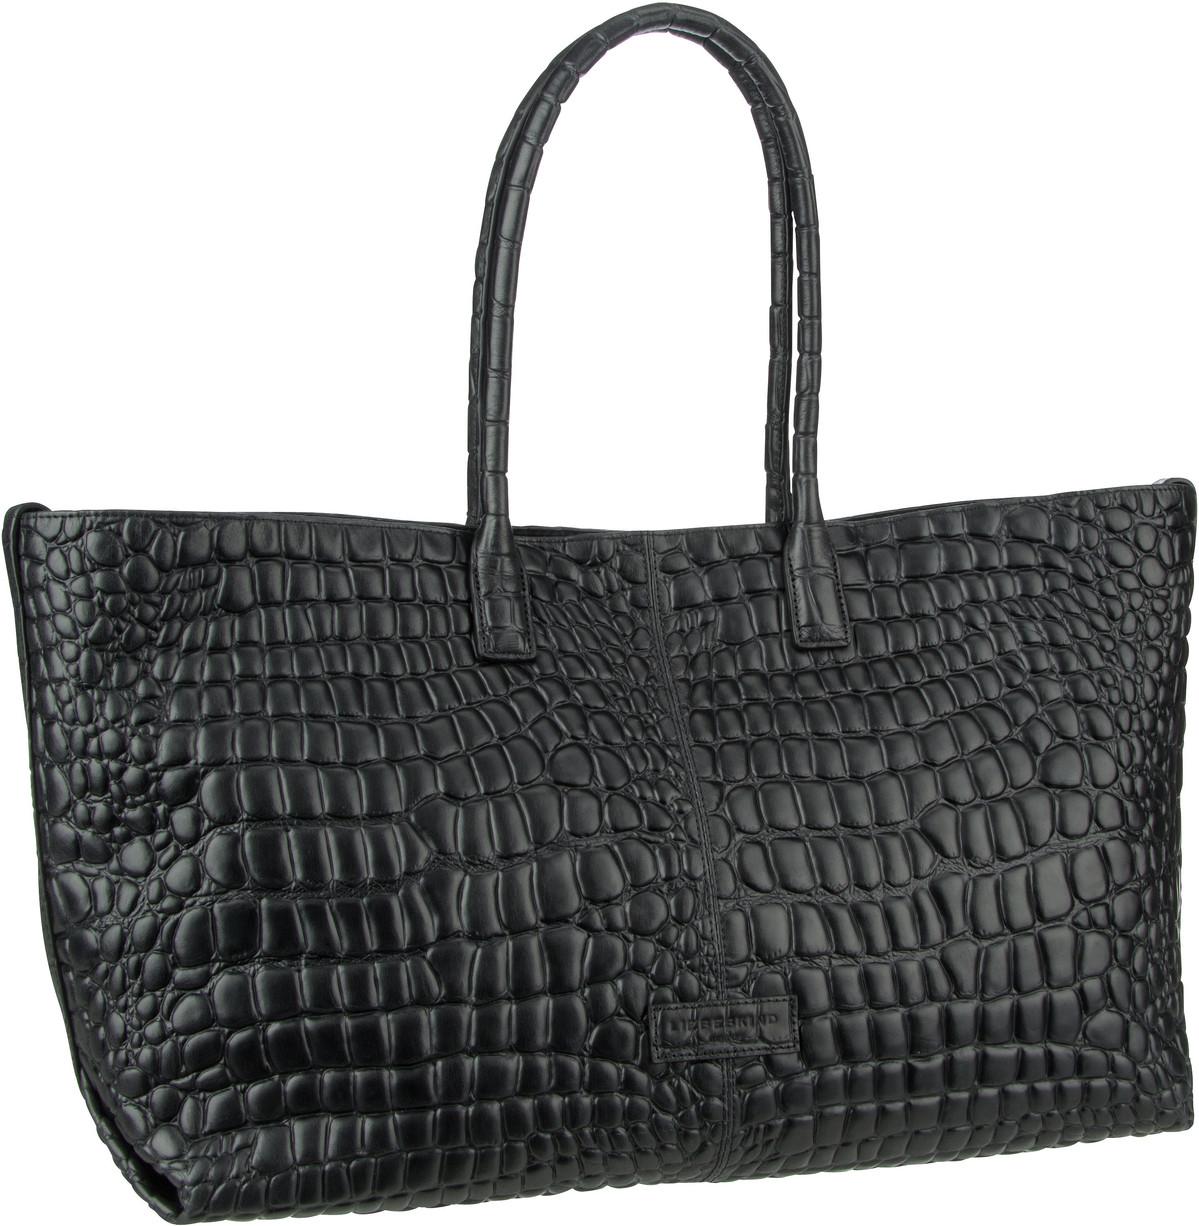 Berlin Handtasche Malibu Chelsea Shopper L Black